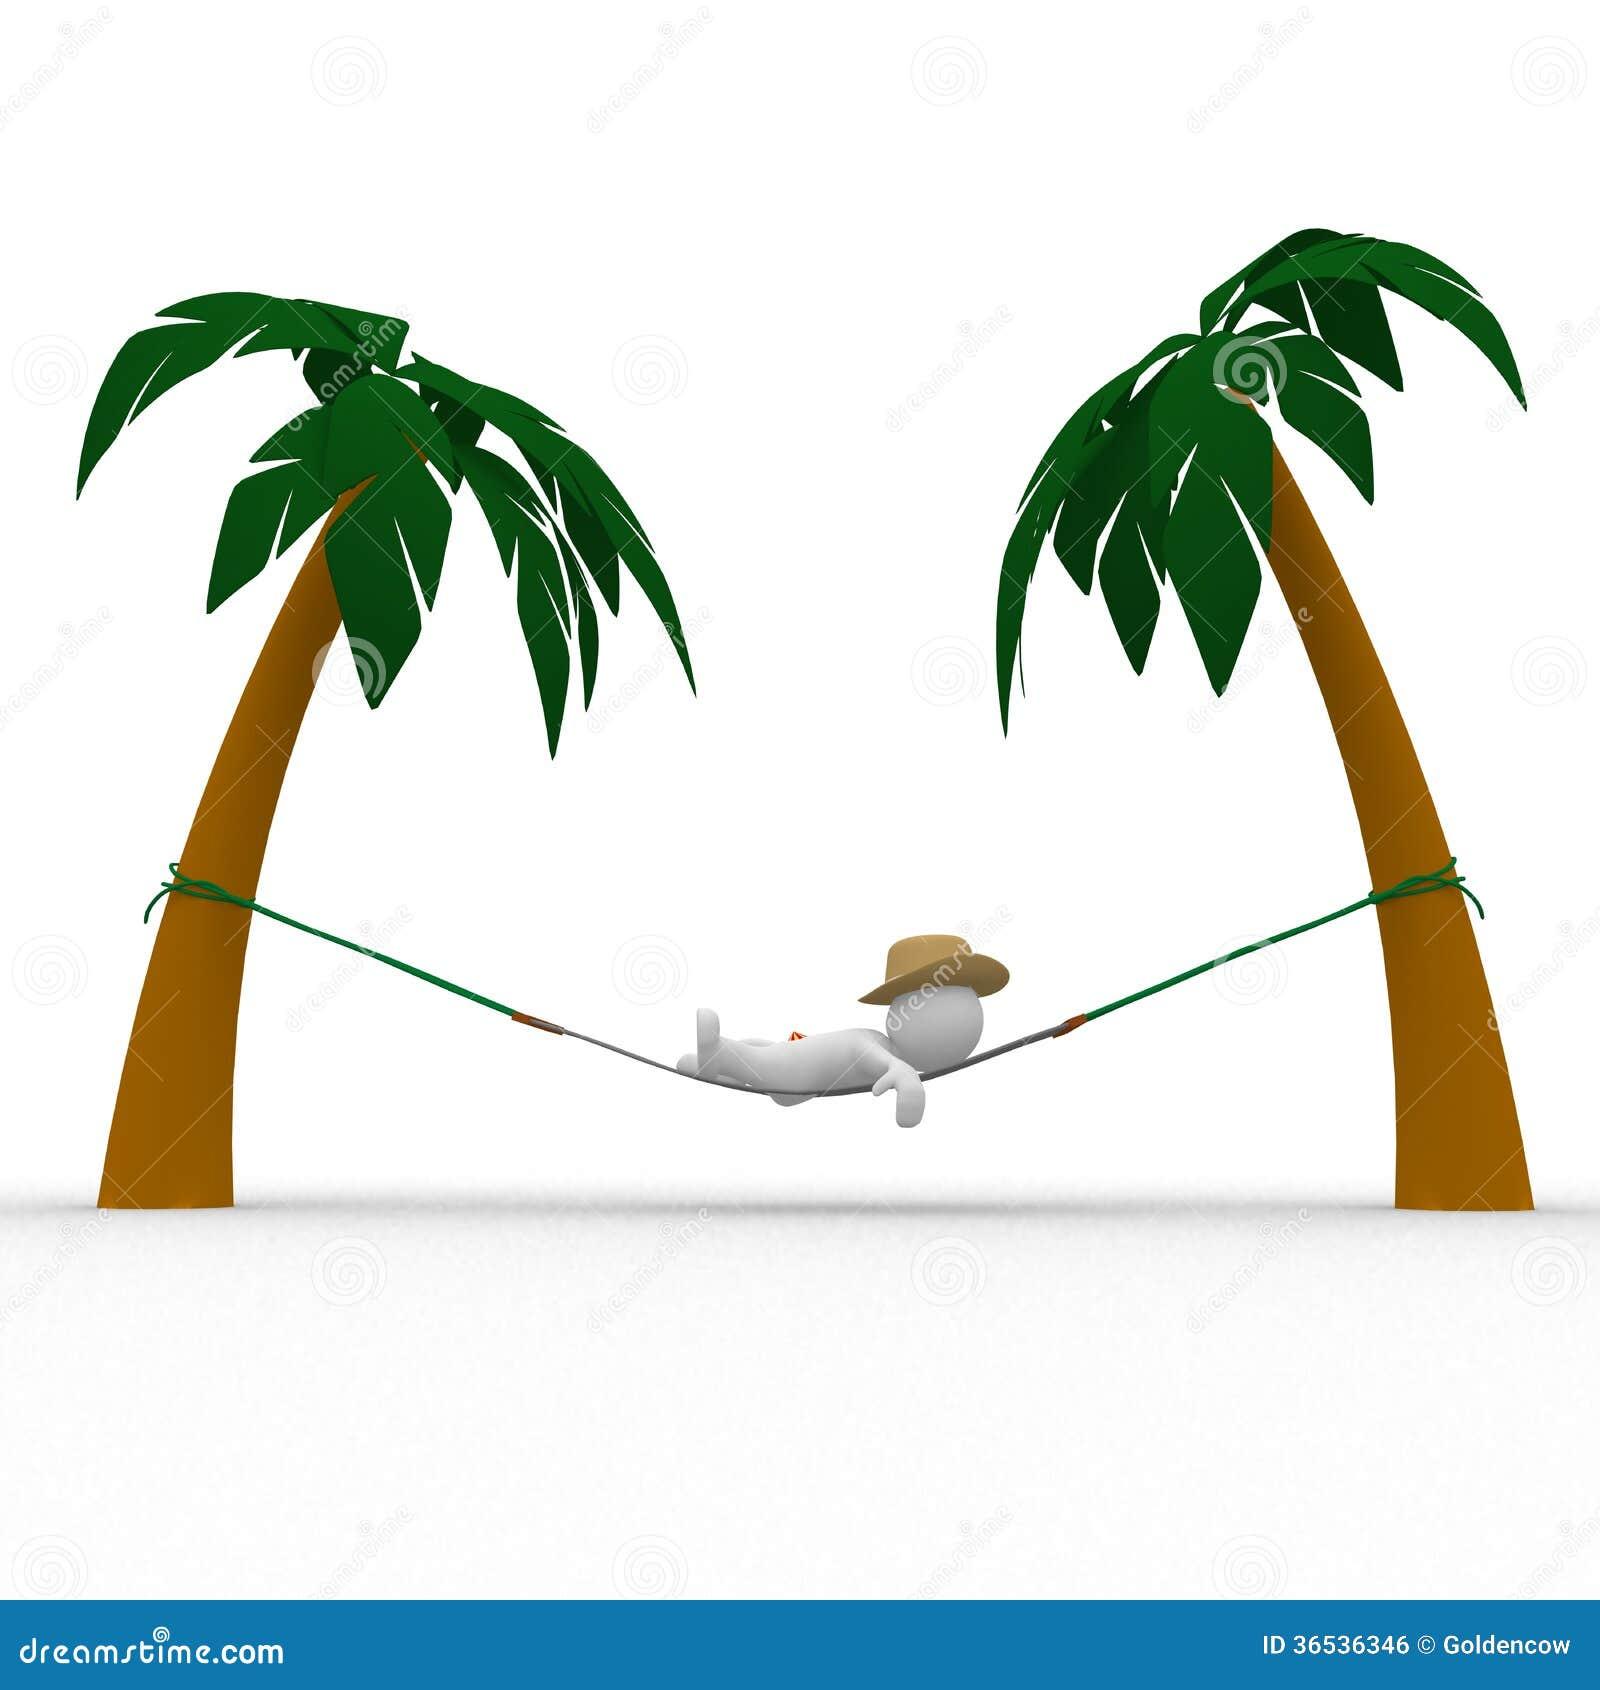 Hammock Between Palm Trees Royalty Free Stock Image